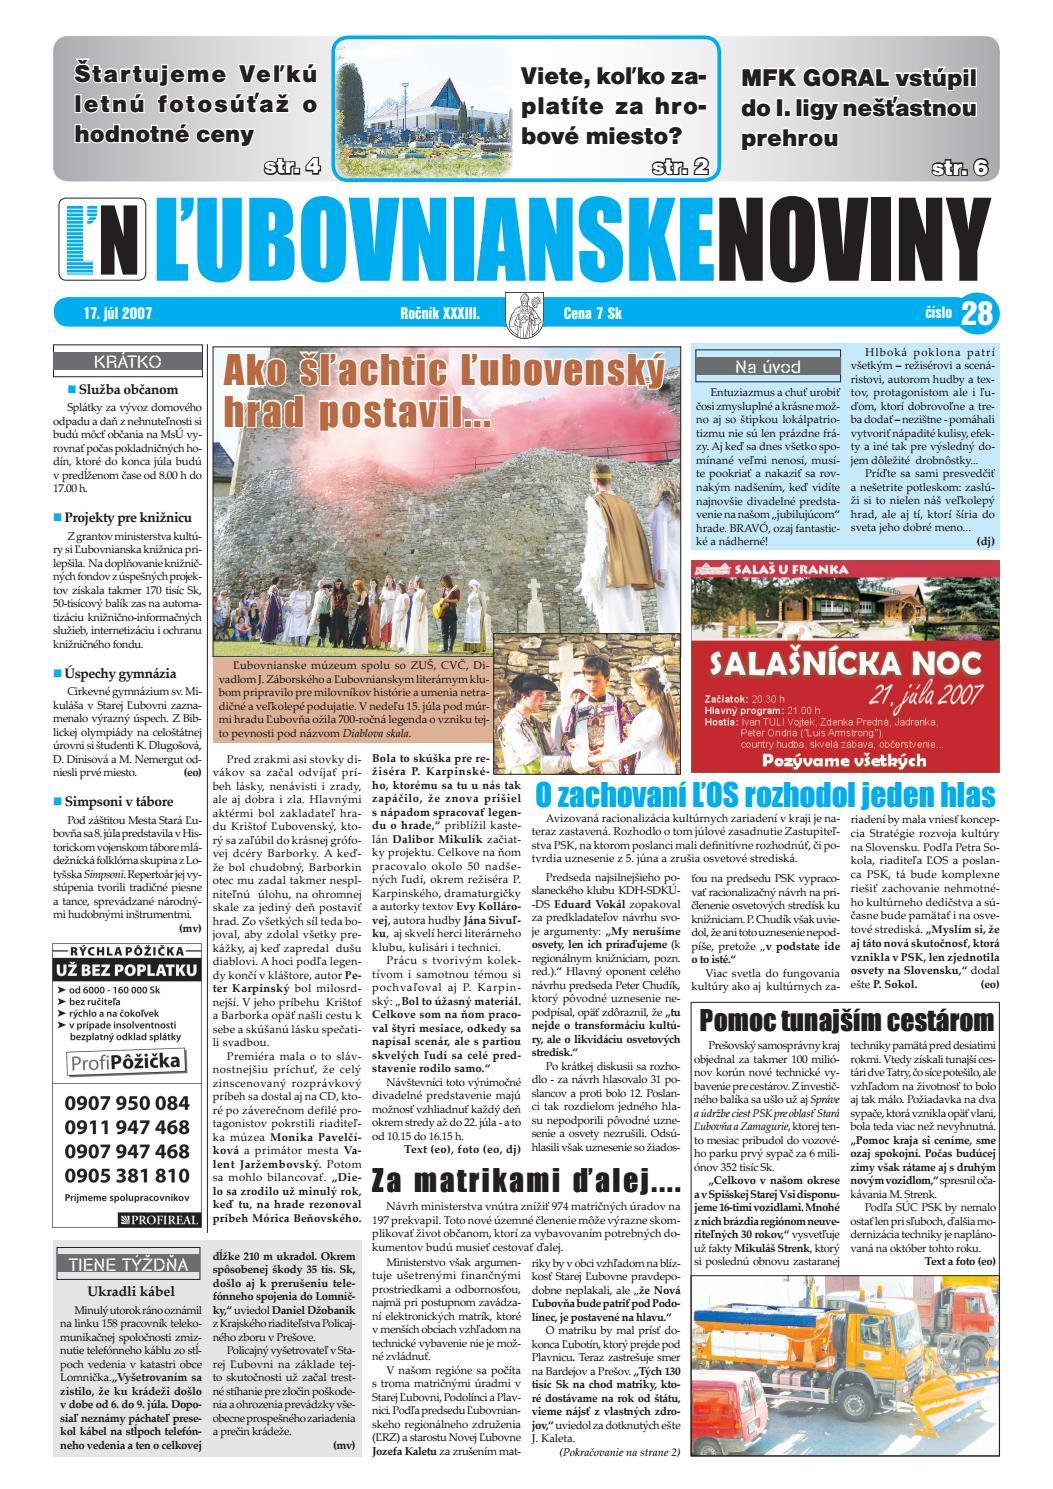 99ac7ea58 28 2006 by Lubovnianske.noviny - issuu